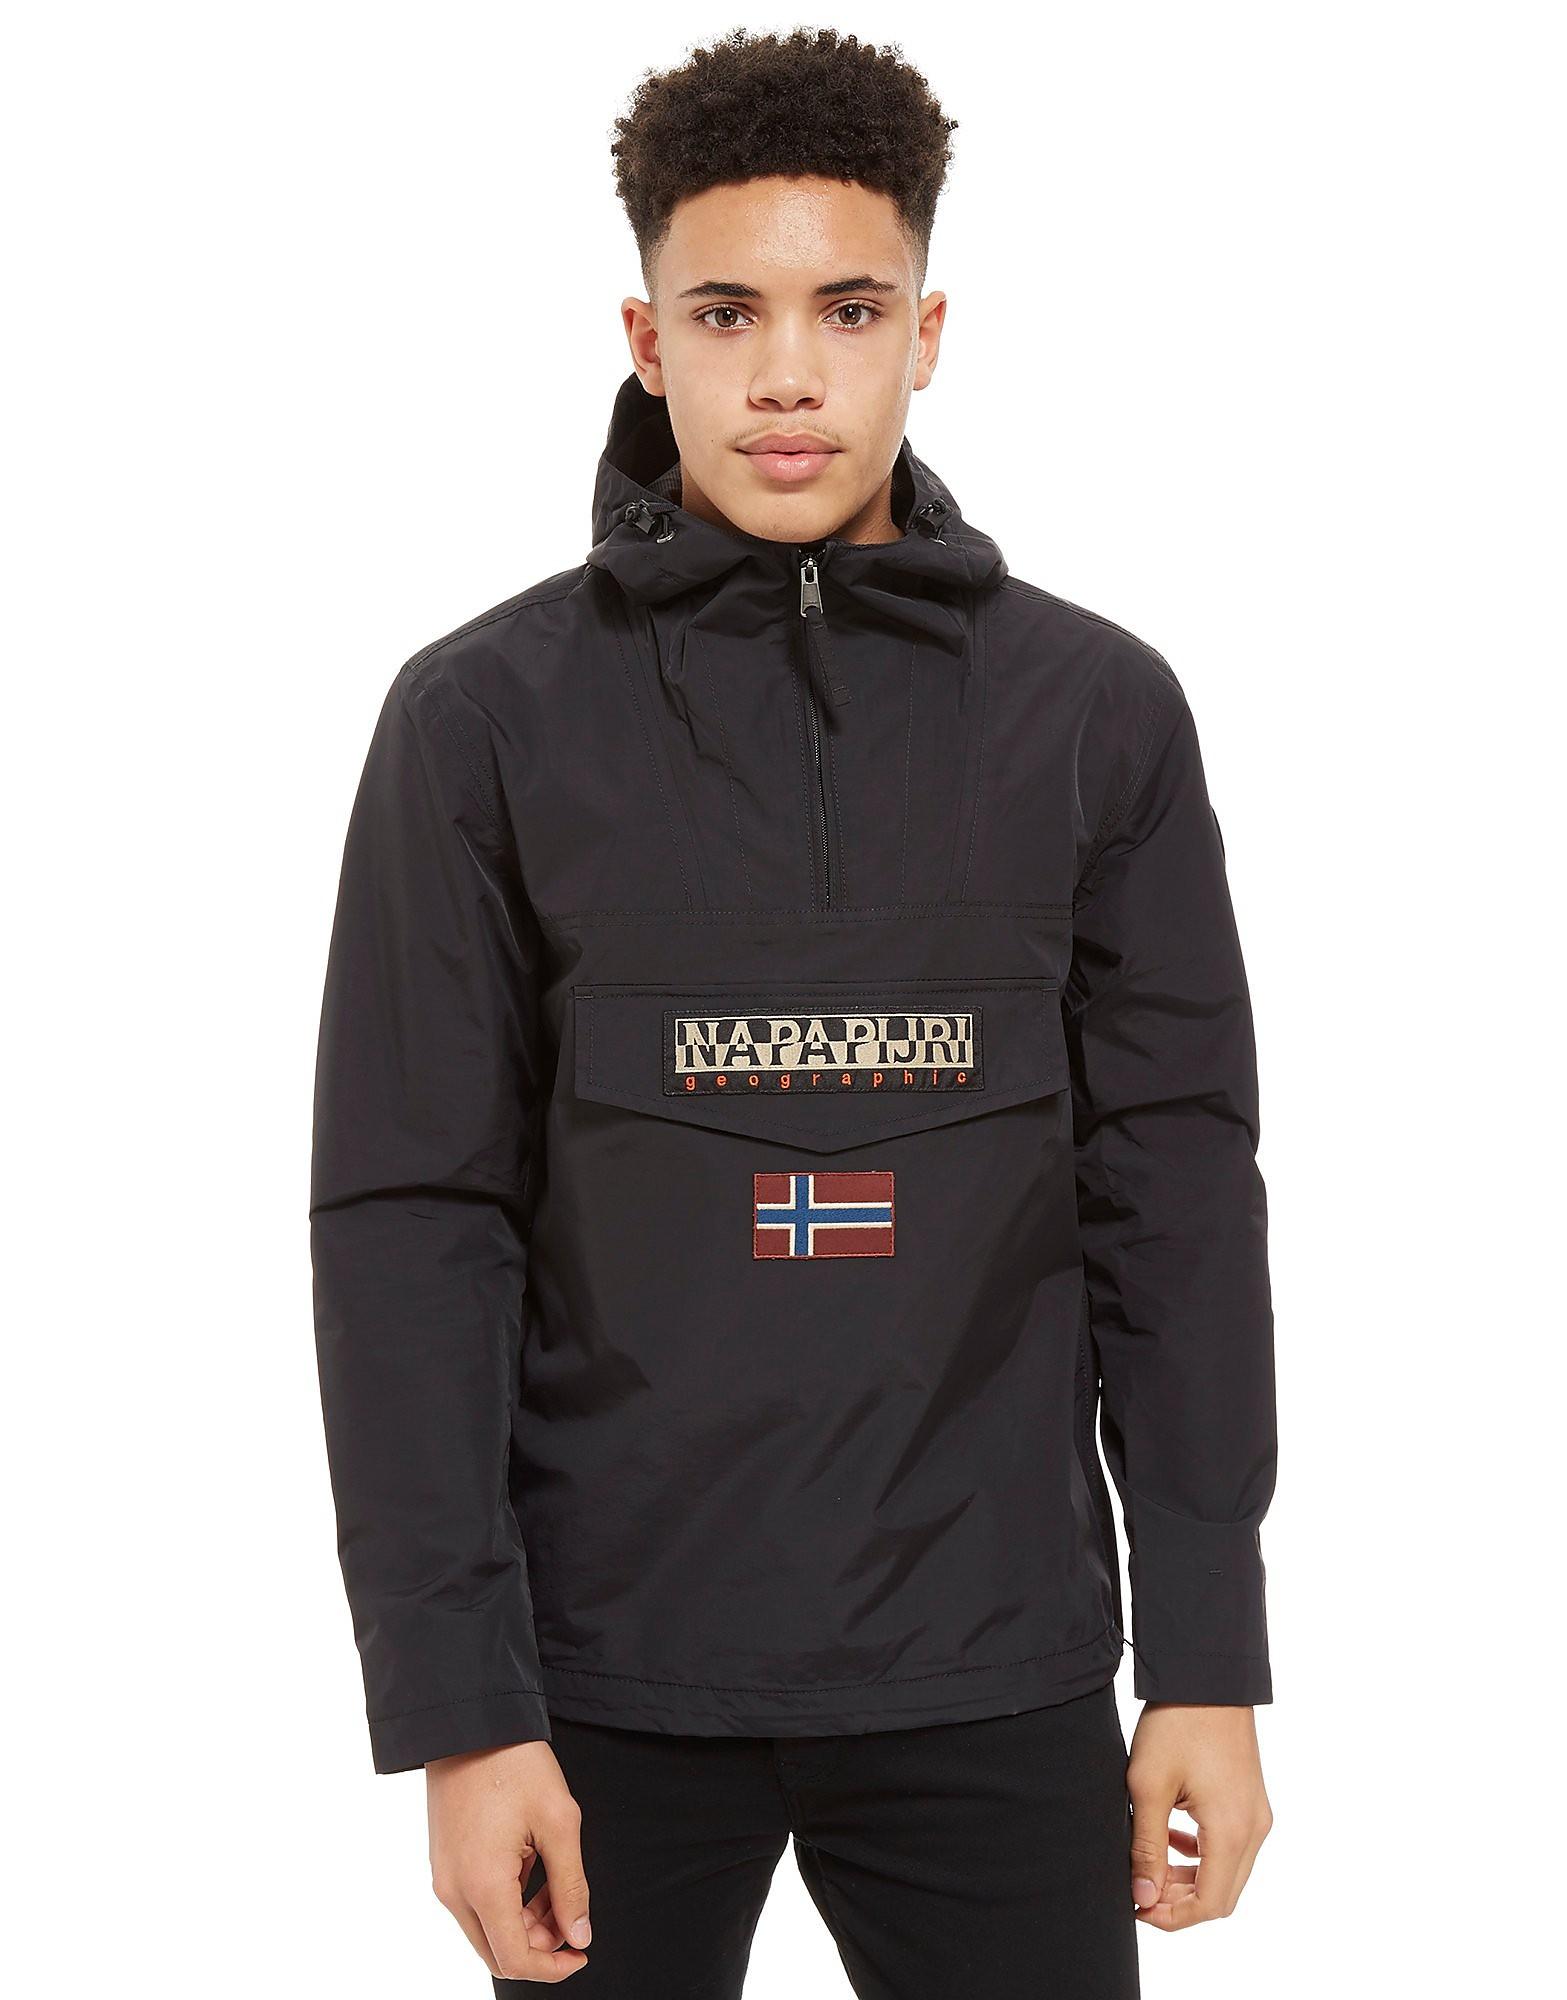 Napapijri chaqueta Rainforest Lightweight